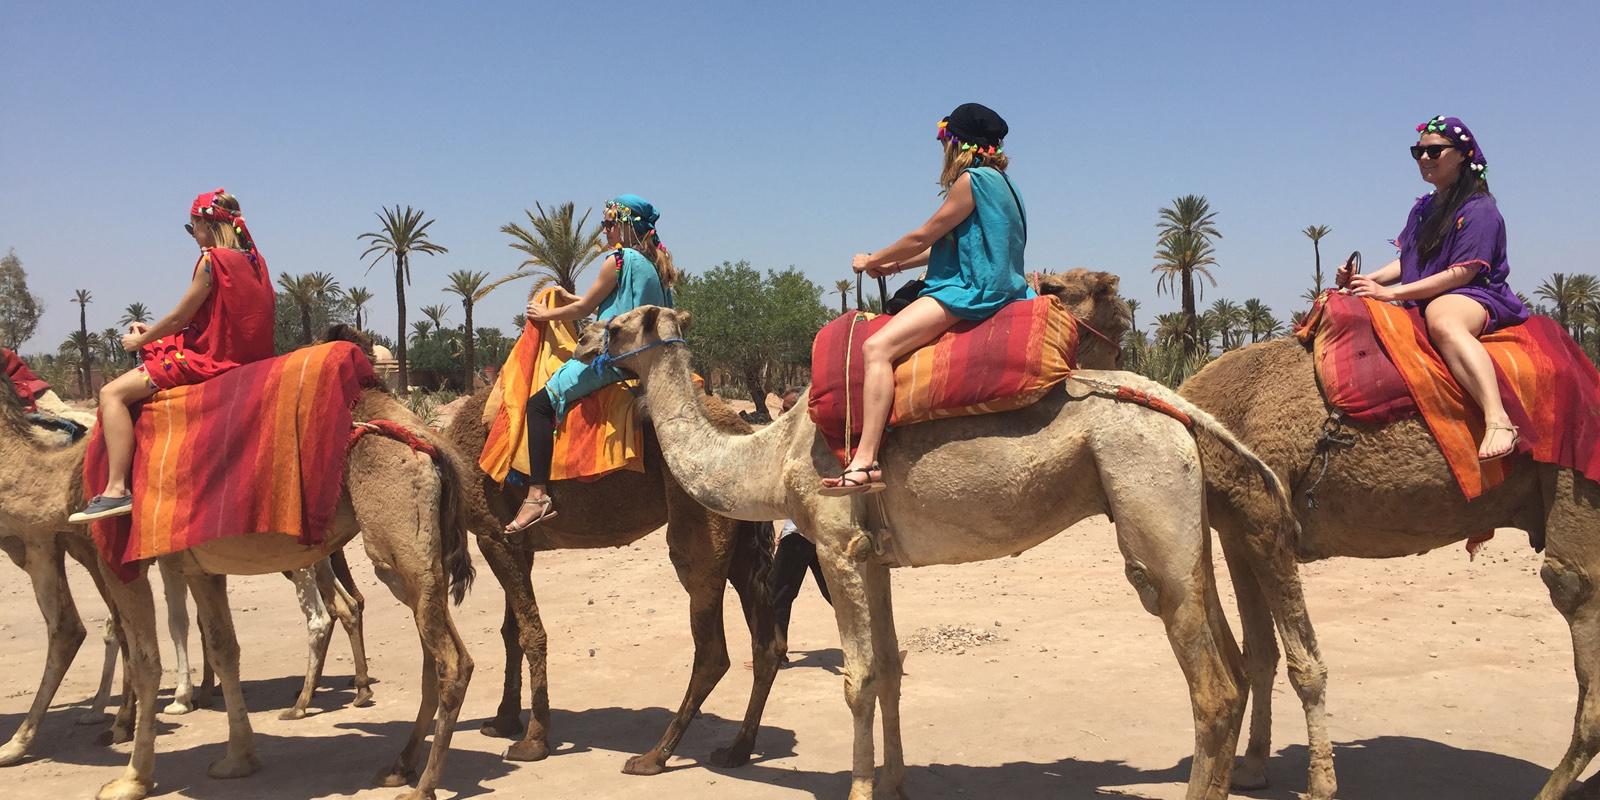 Marrakech : Balade au dos de dromadaire | Maroc Excursion